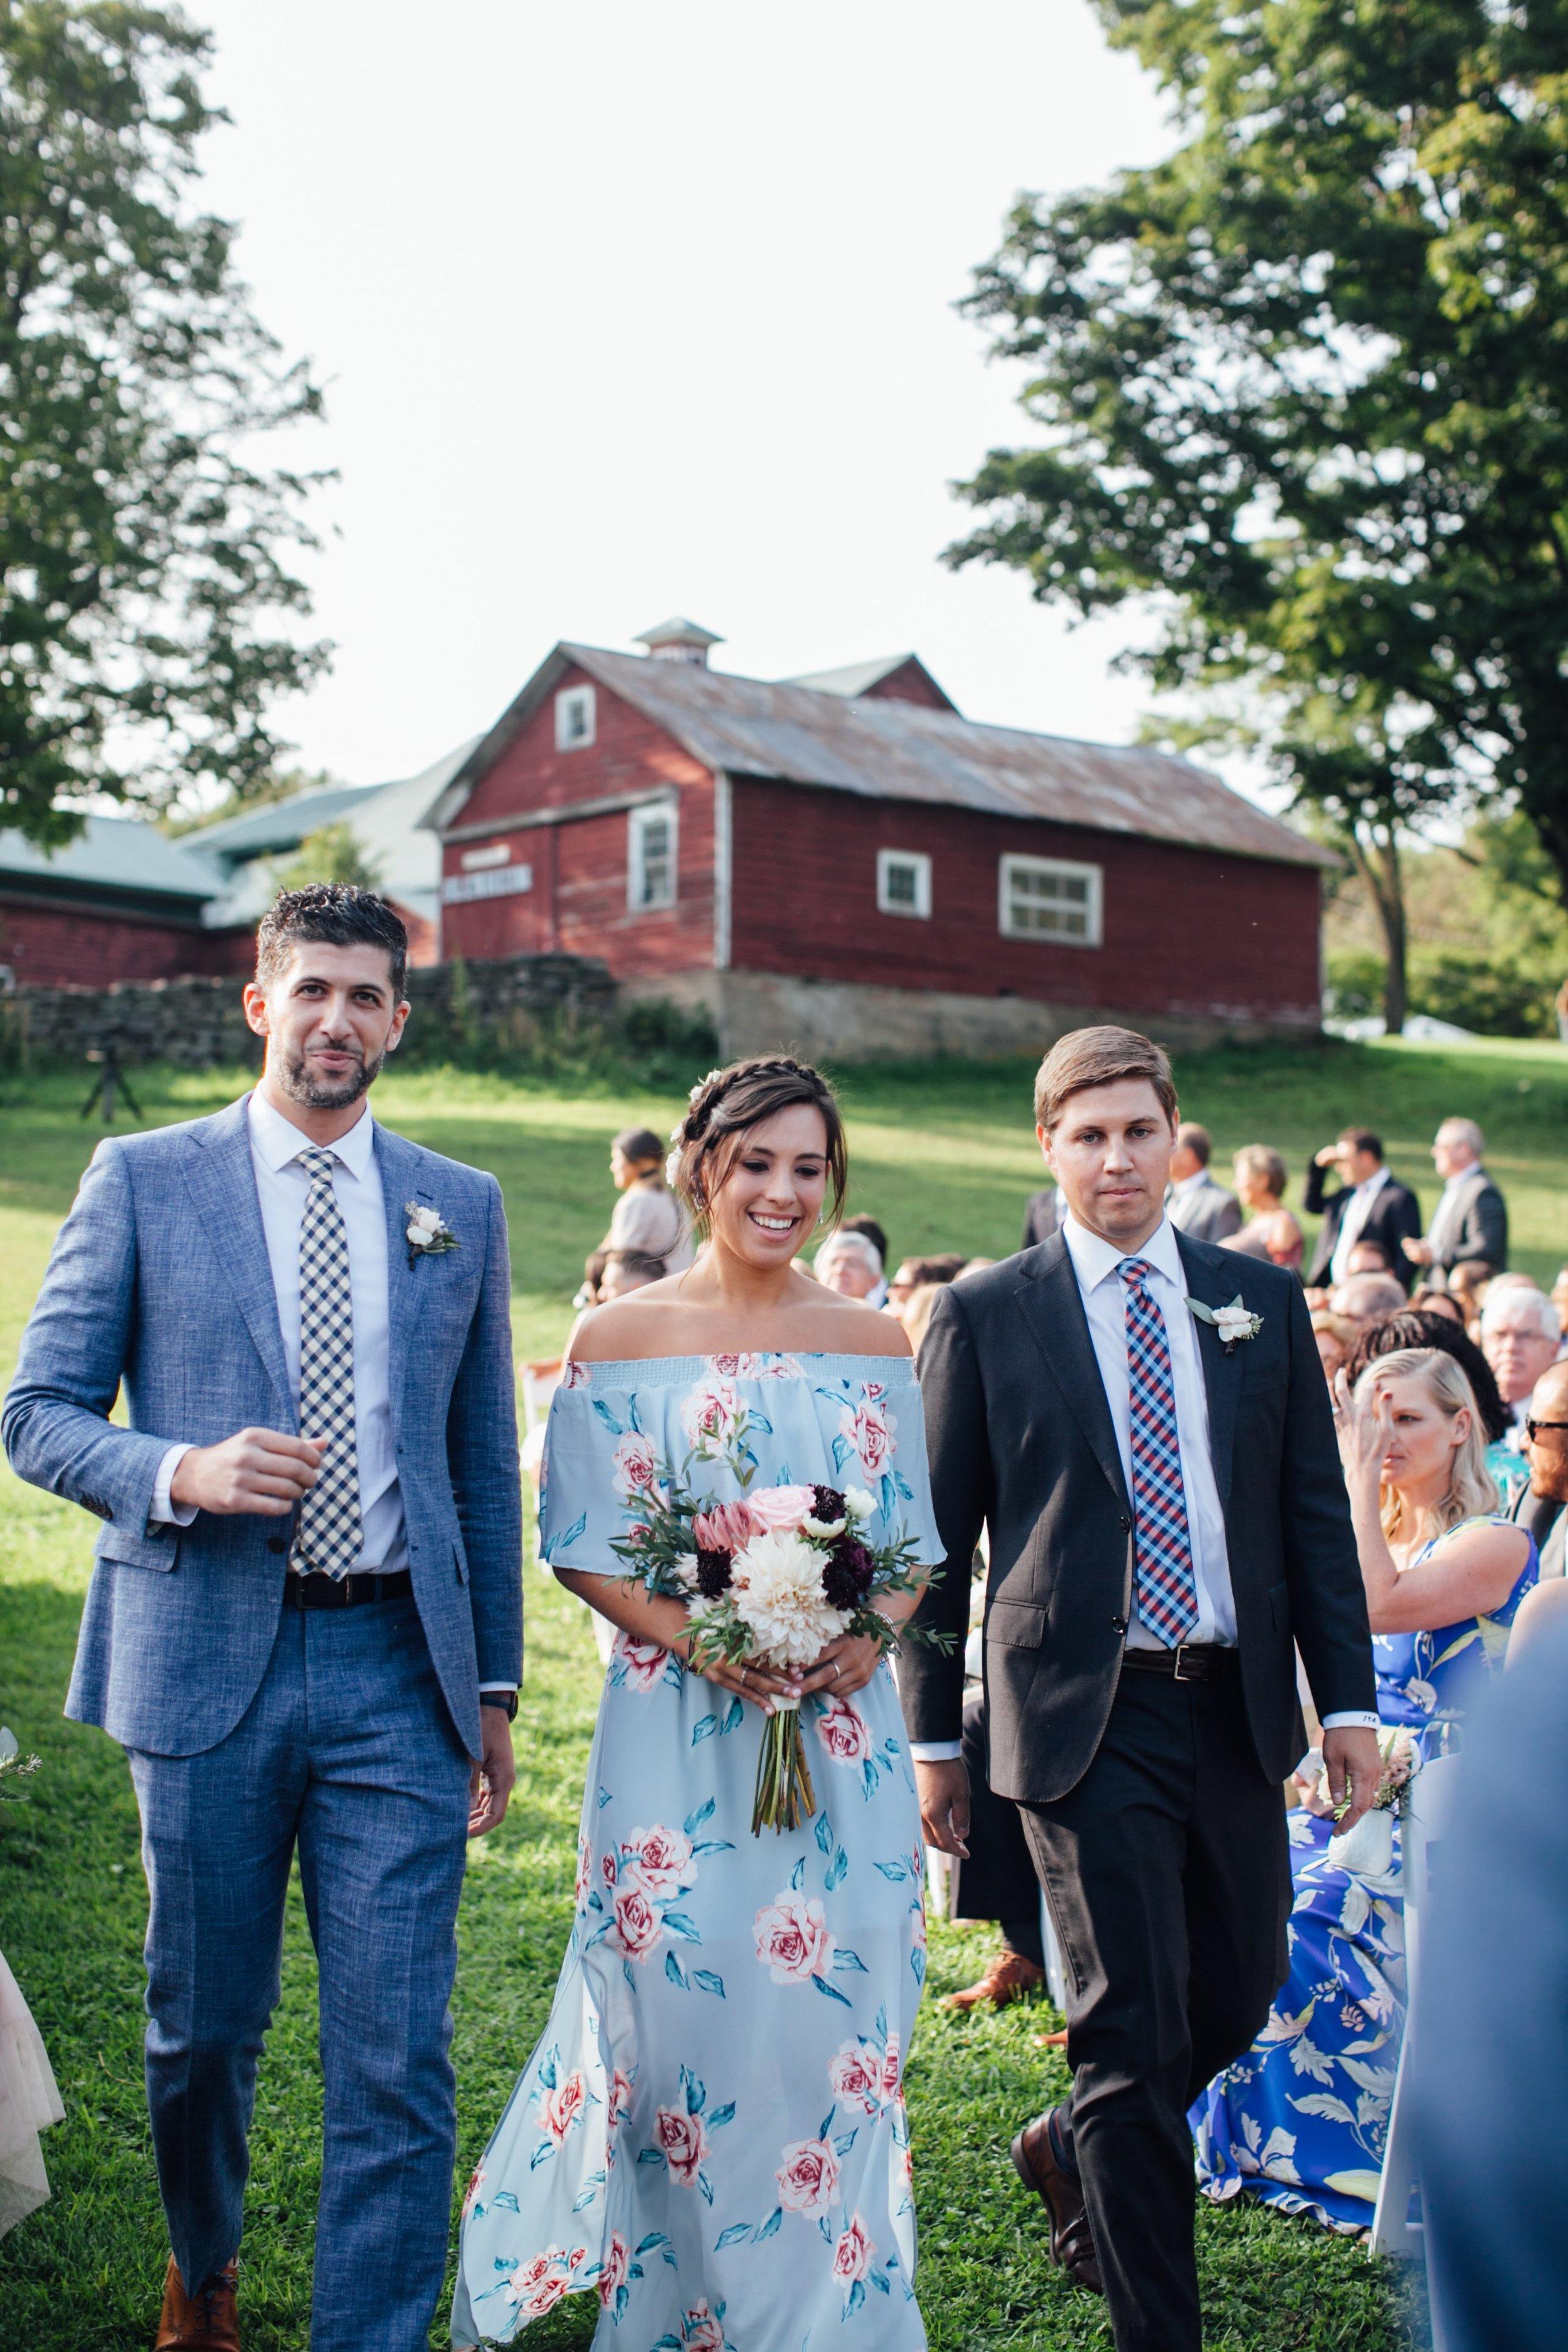 Courtney + Matt Blenheim Hill Farm Catskills NY Wedding Veronica Lola Photography 2017-356.jpg